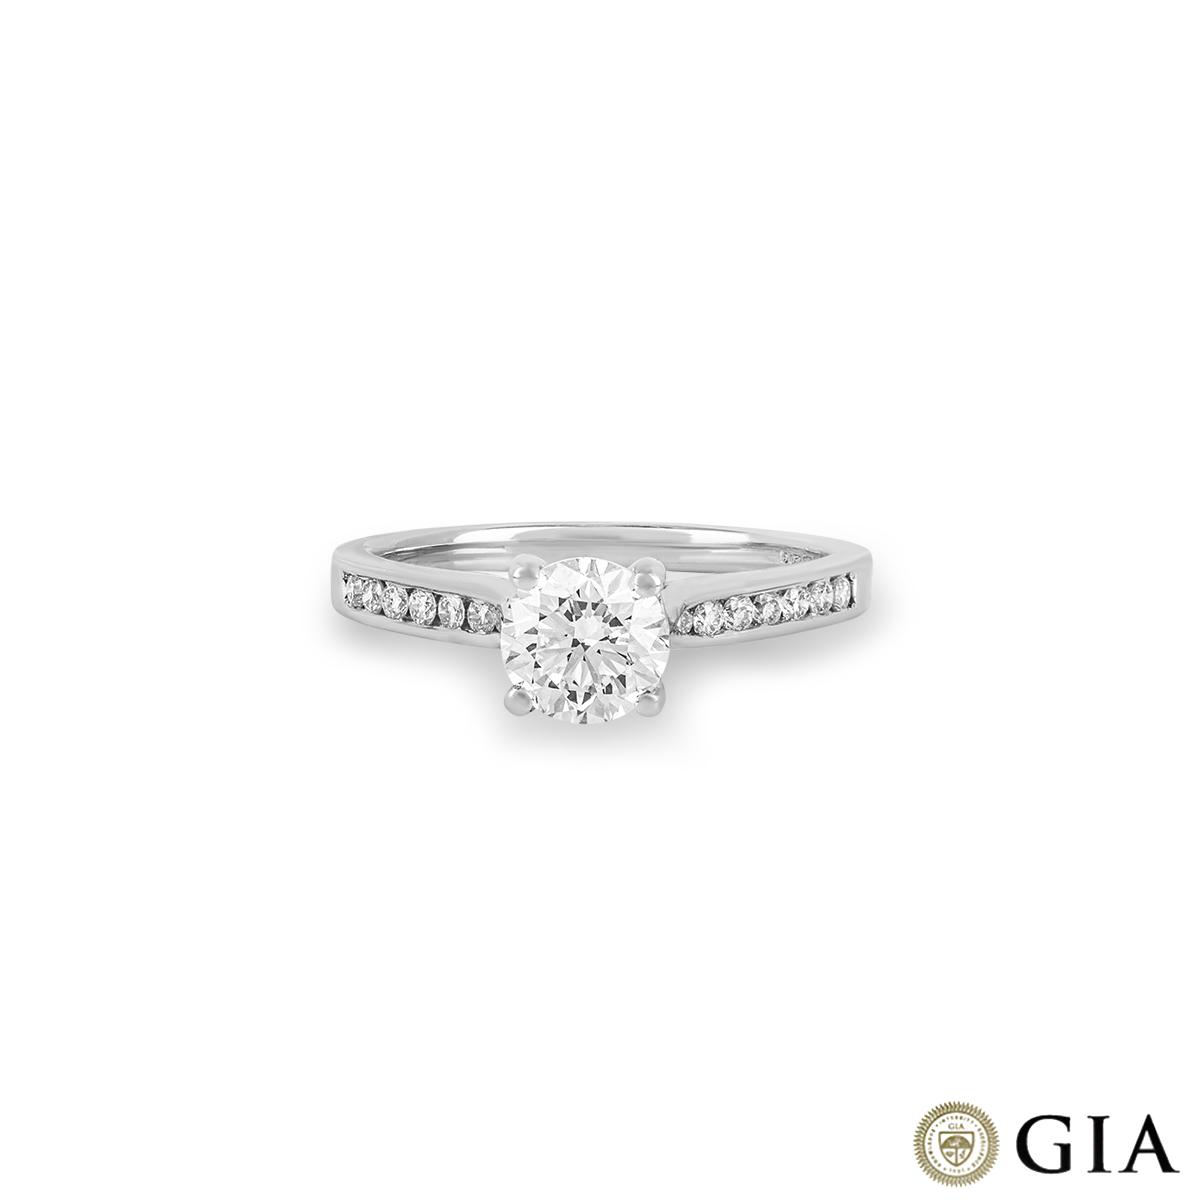 18k White Gold Round Brilliant Cut Diamond Ring 0.90ct H/VS1